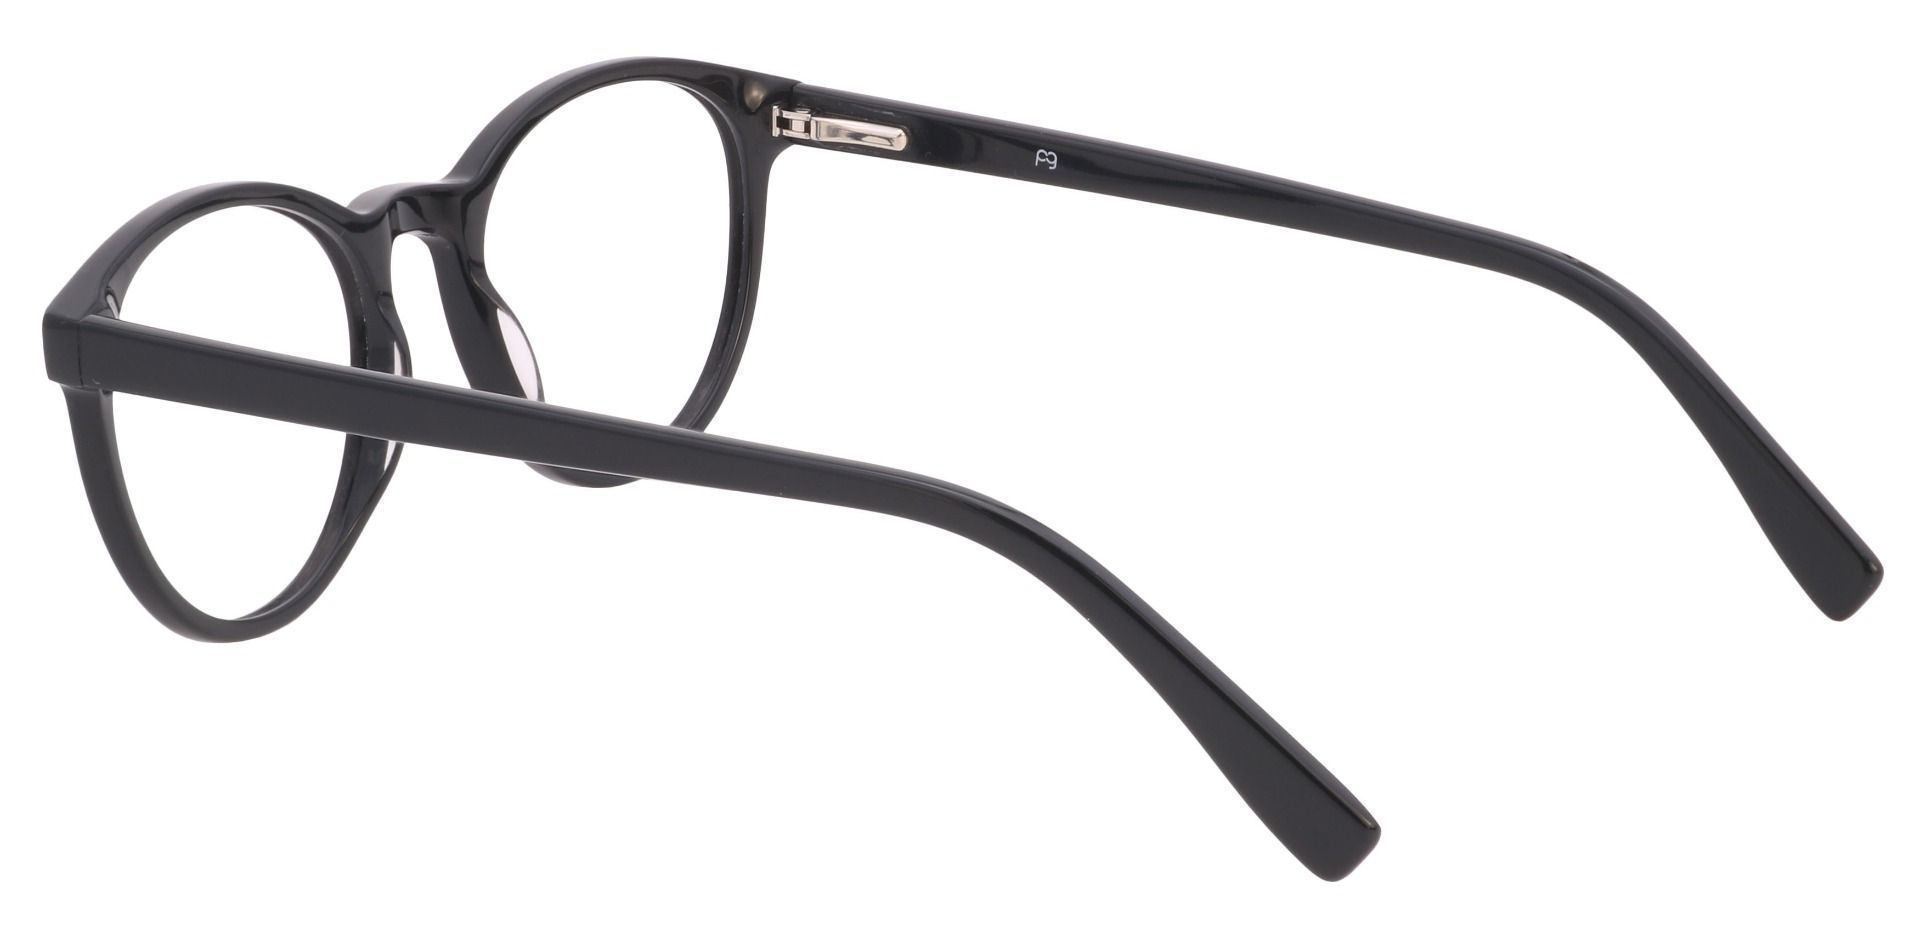 Stellar Oval Reading Glasses - Black